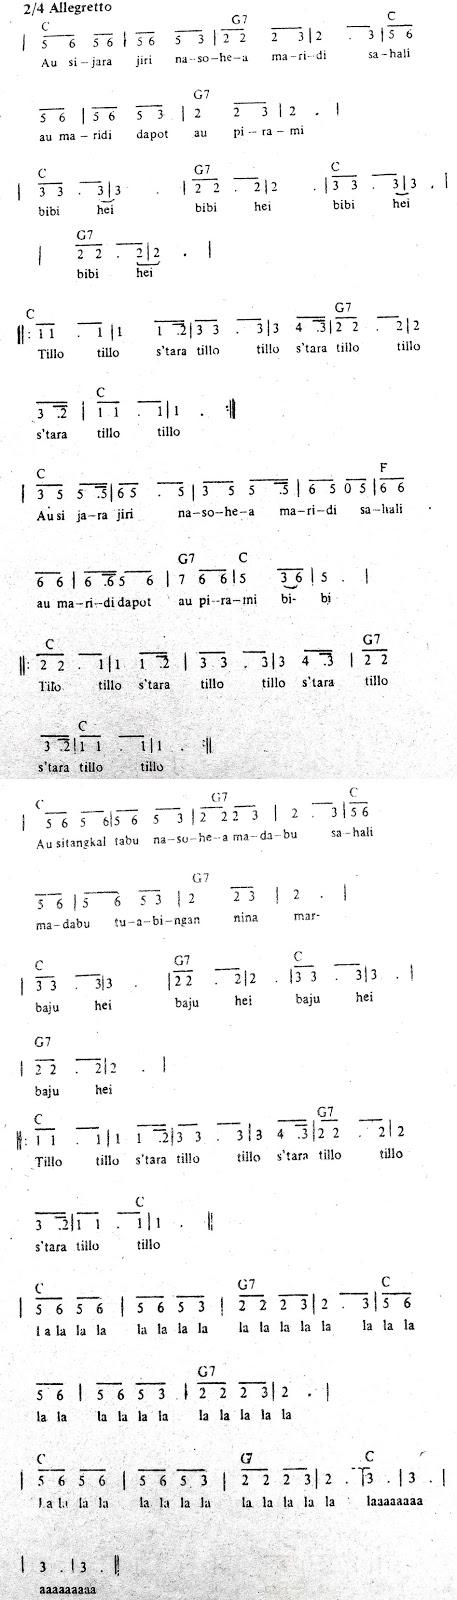 Chord & Arti Lirik Lagu Sumatera Utara: Sitara Tillo + Not Angka